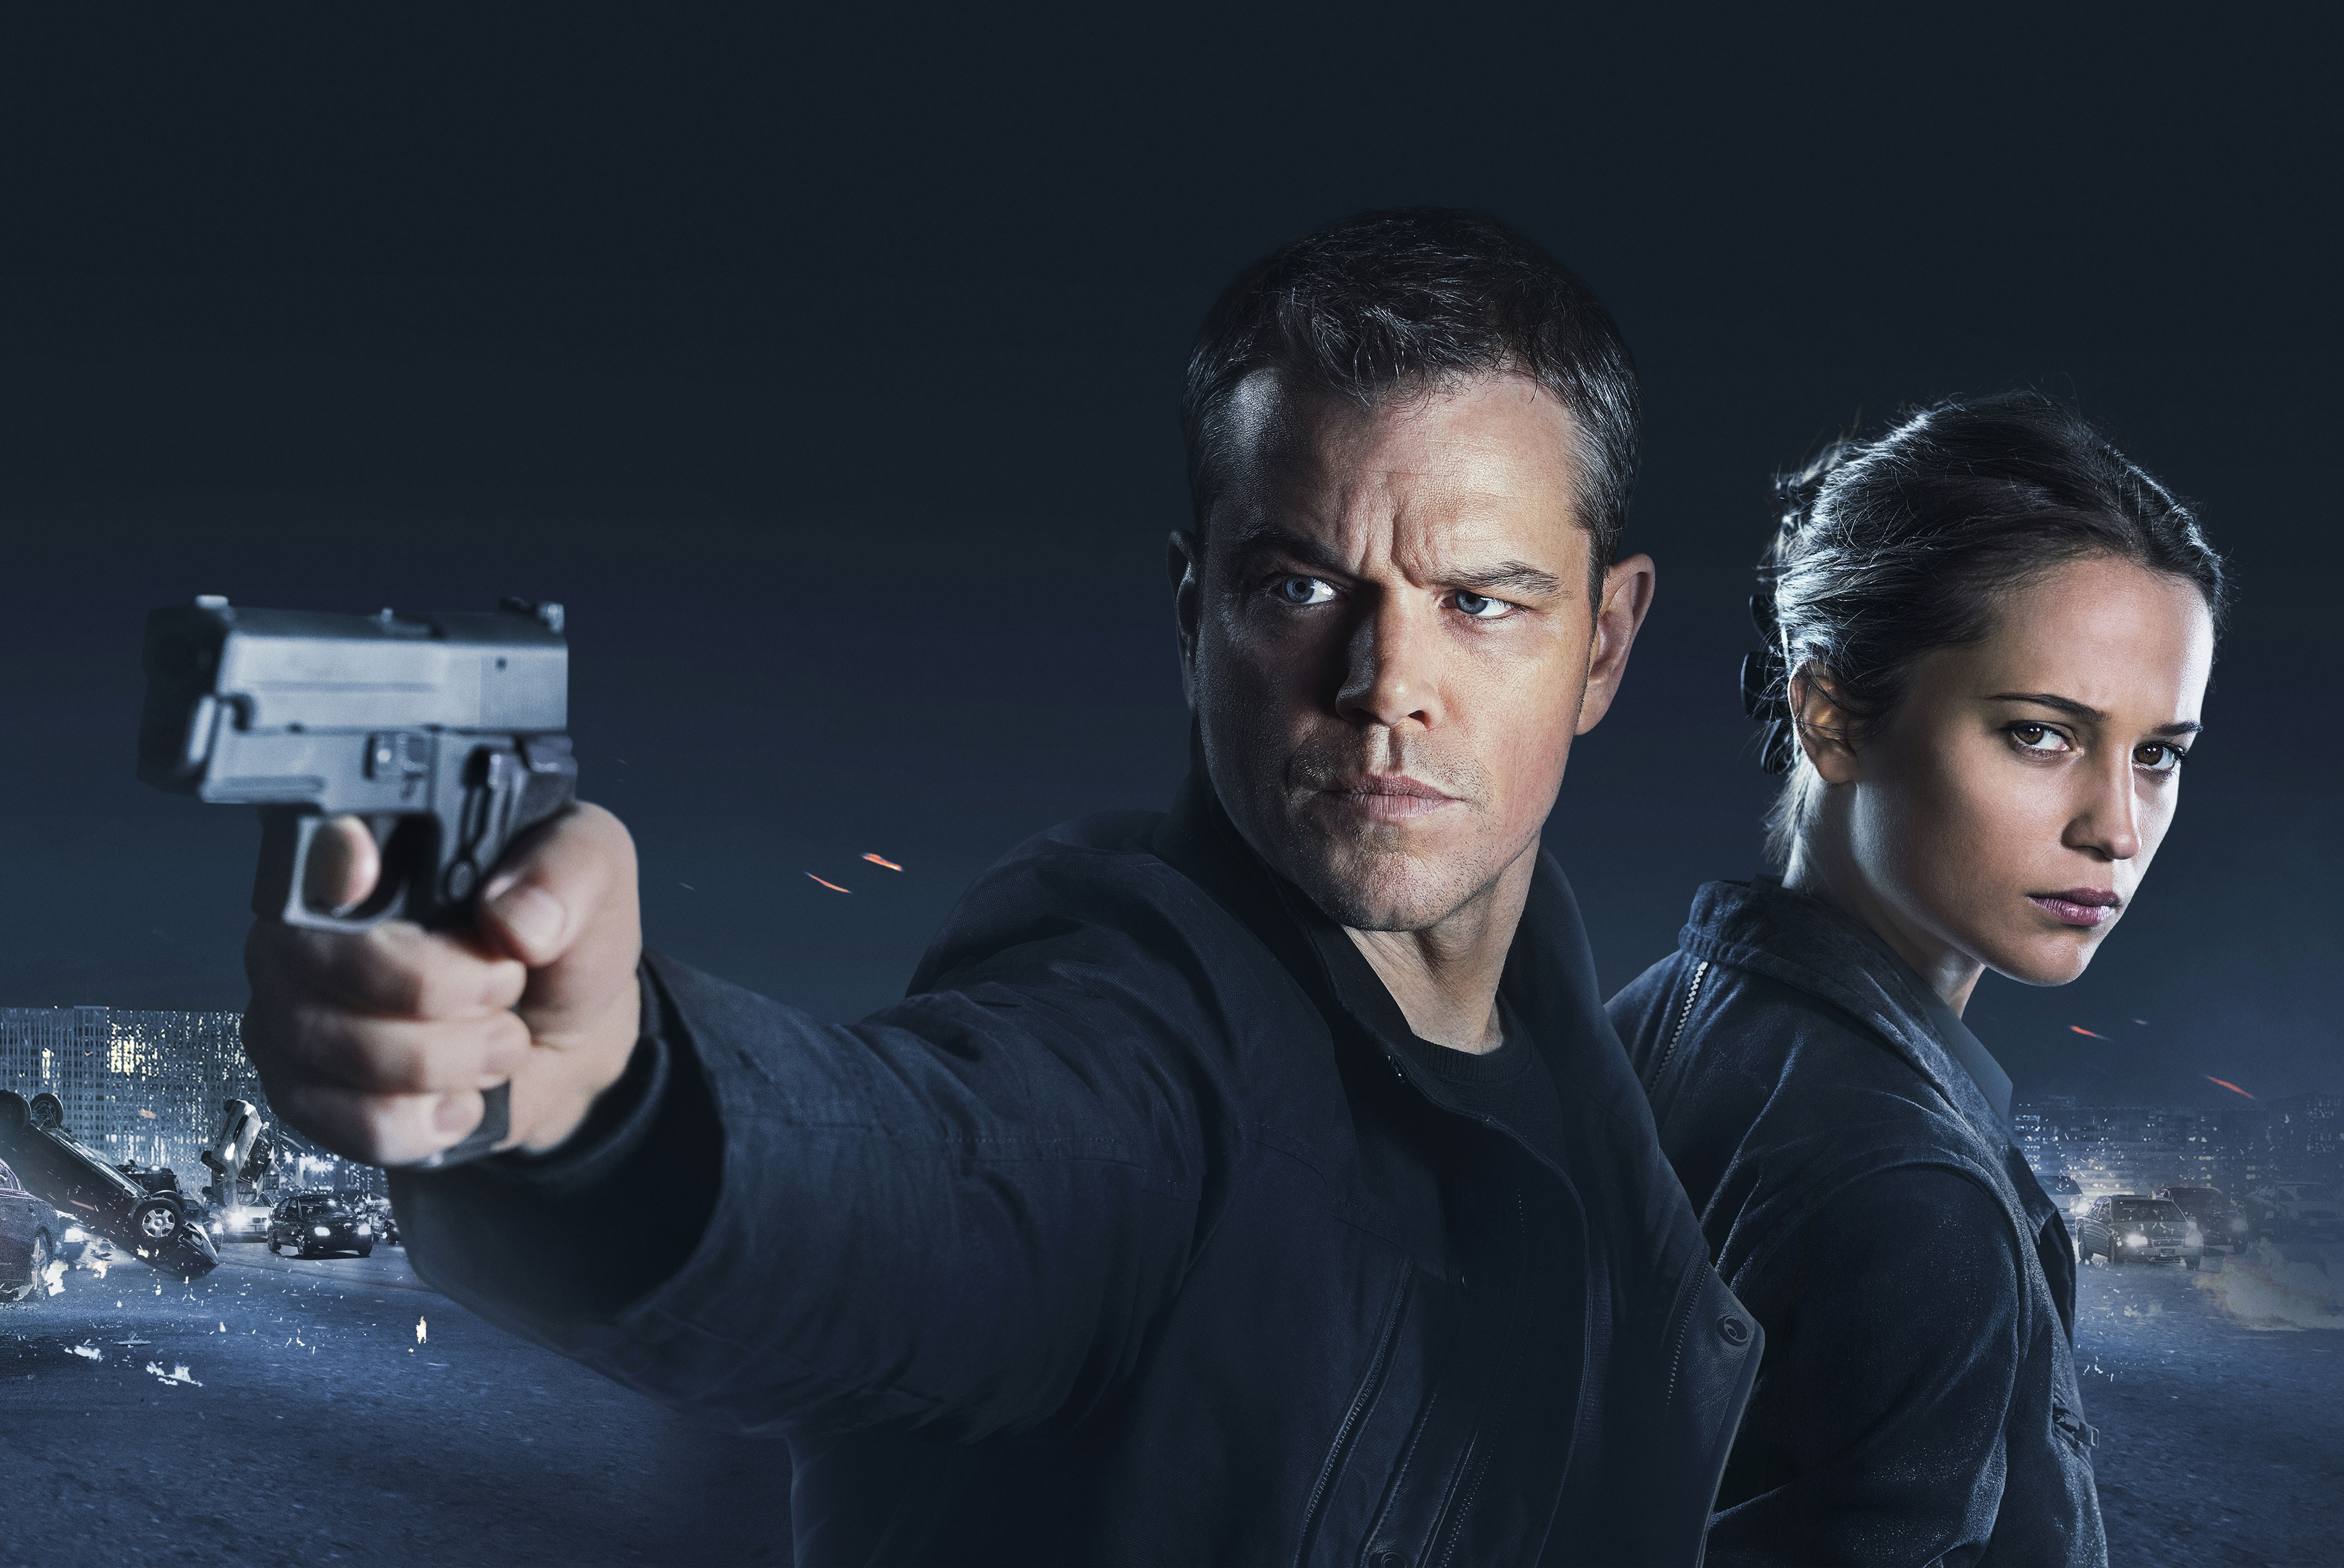 Jason Bourne Official Movie Poster Wallpaper